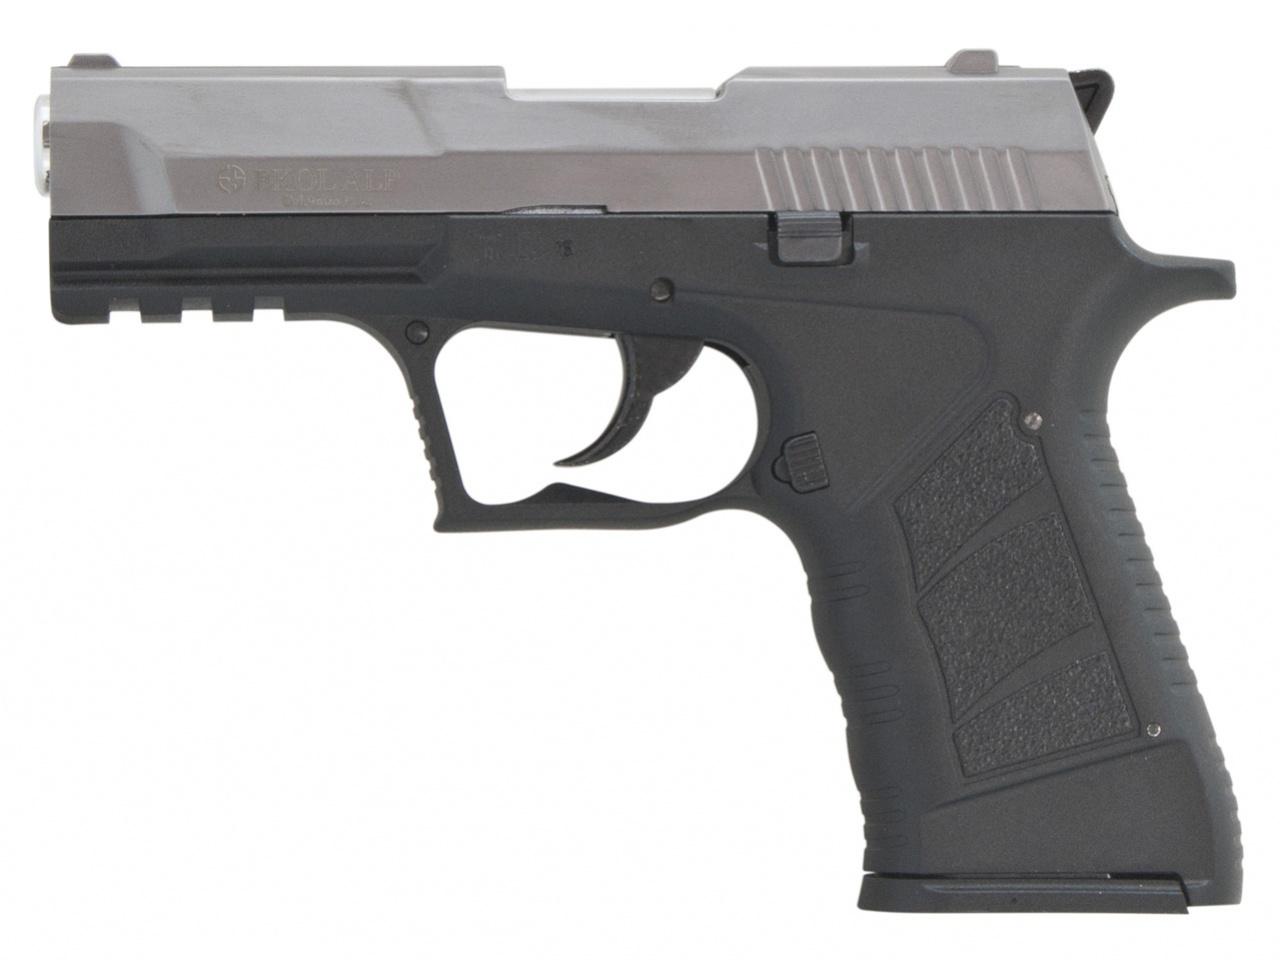 Pistolet gazowy Ekol Alp titan kal.9mm